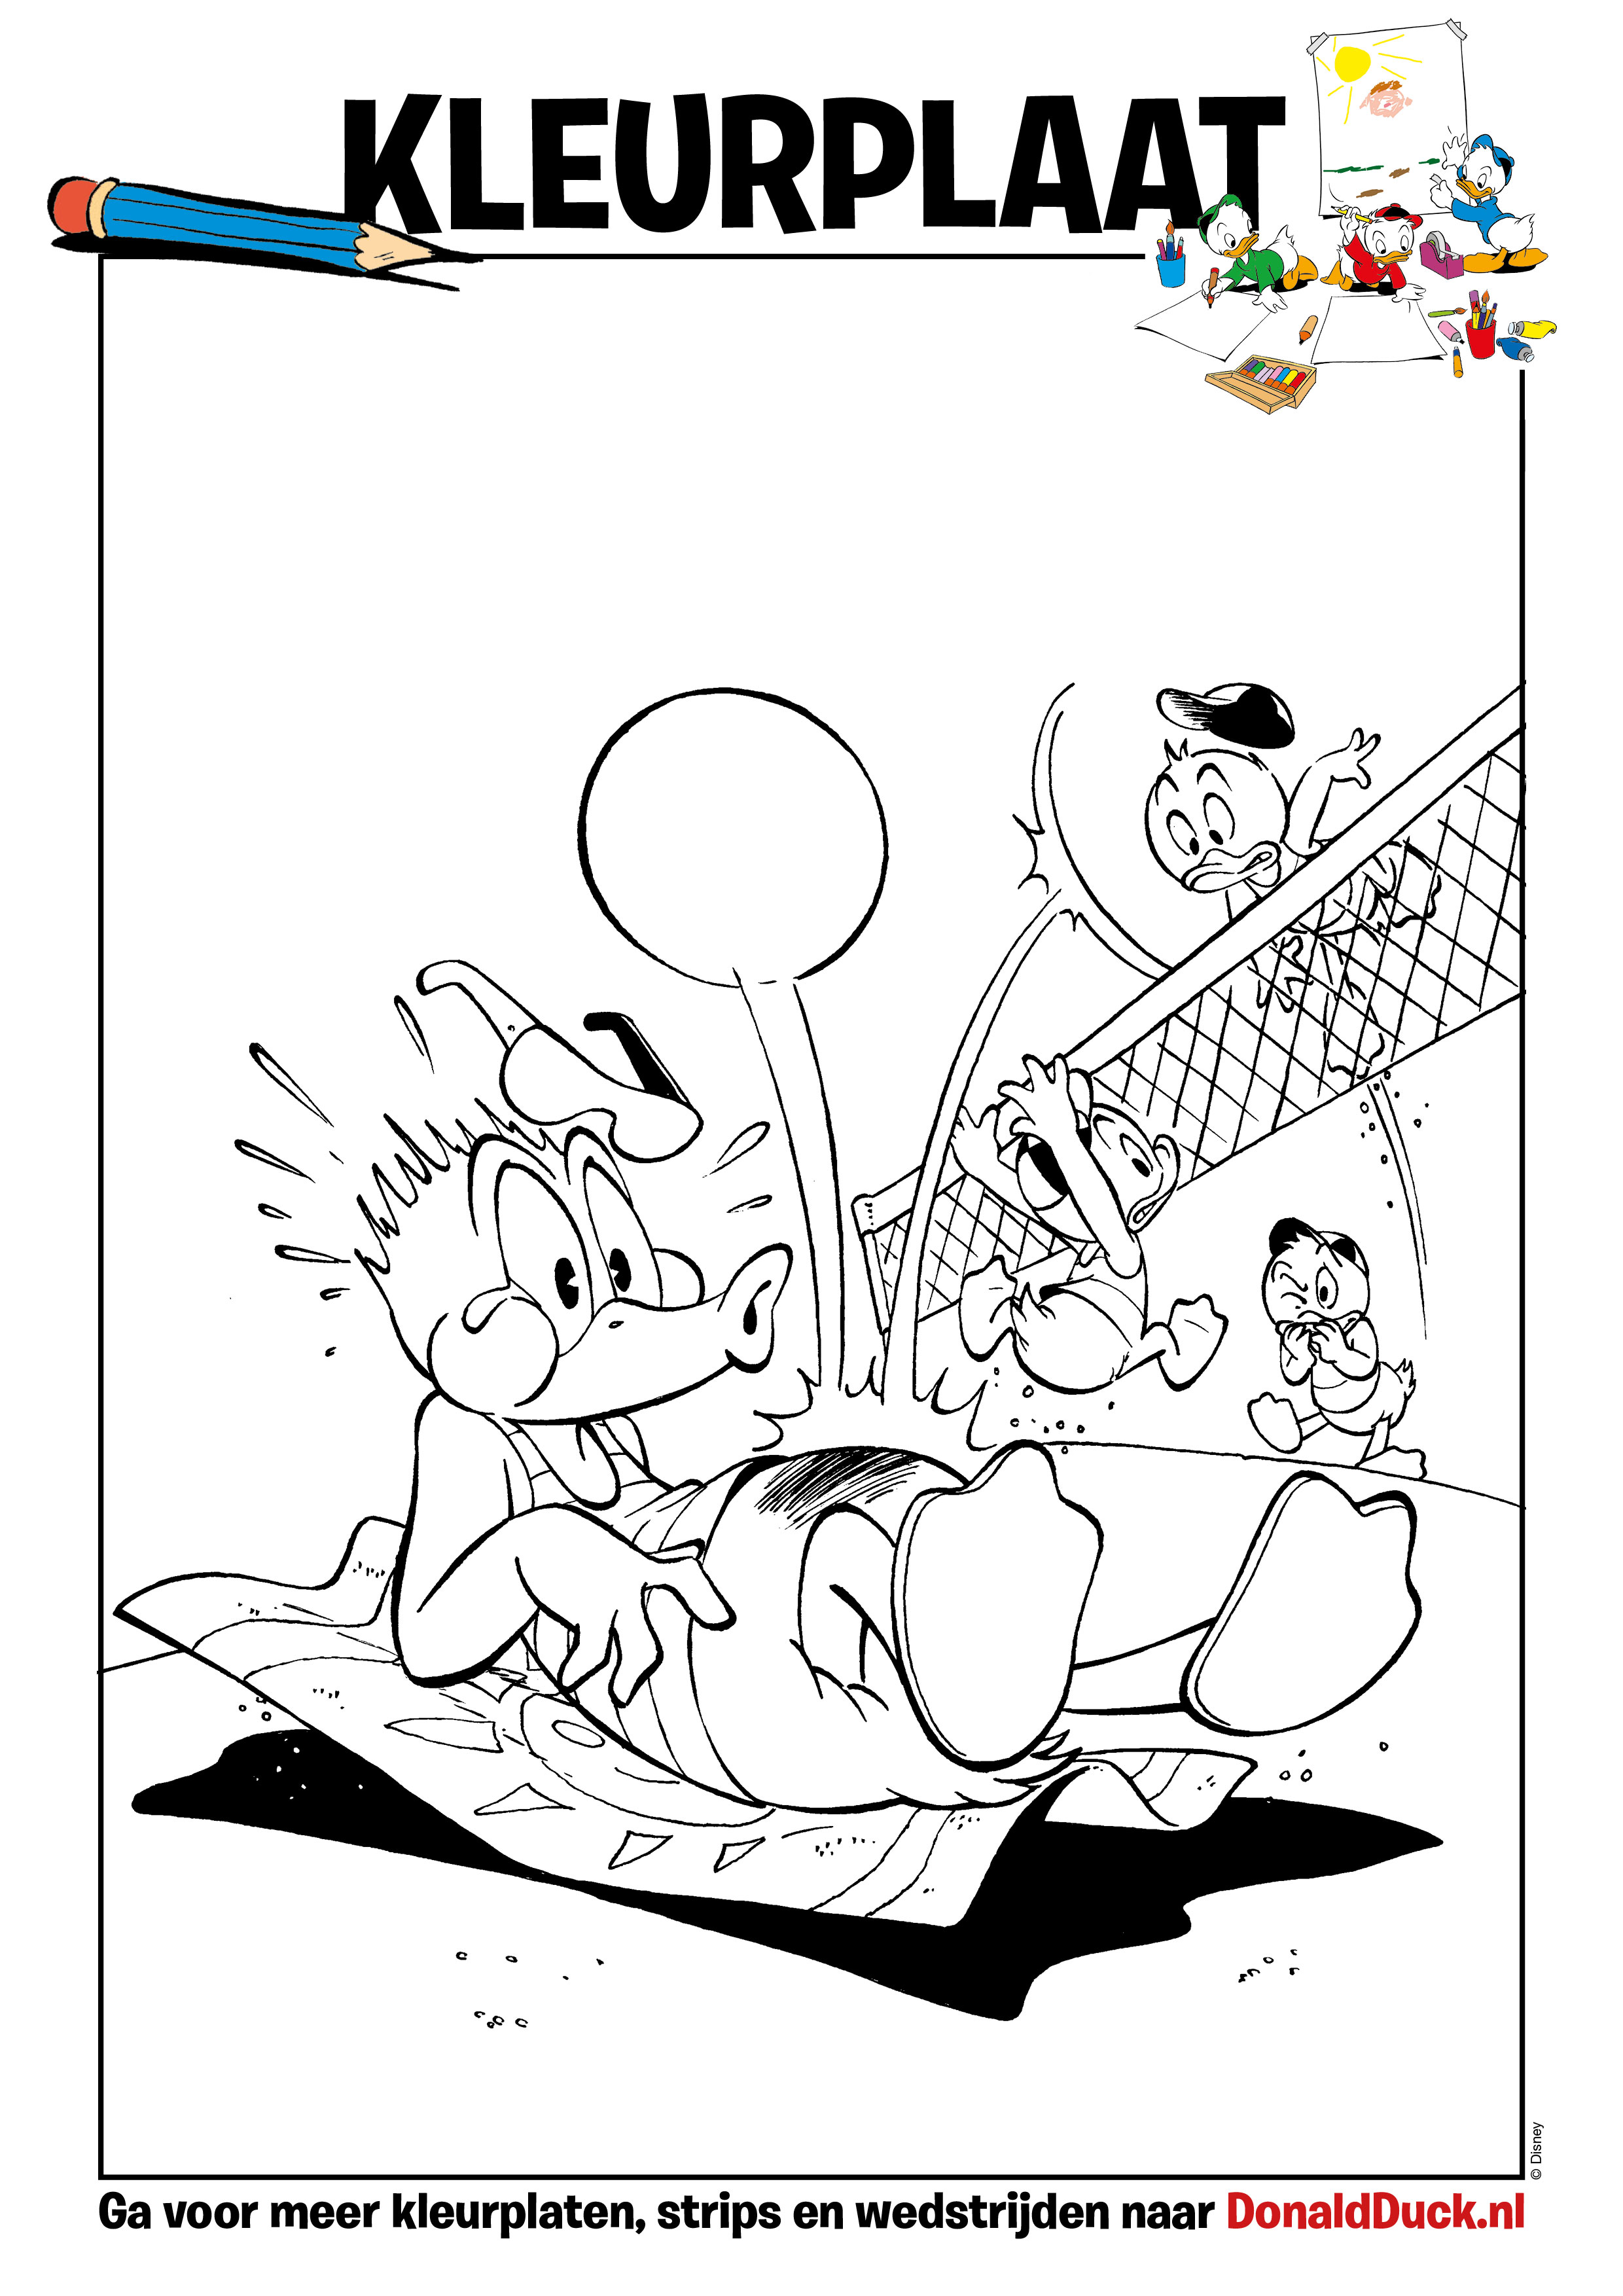 Donald Duck Junior Kleurplaten.Kleurplaat Volleybal Donaldduck Nl